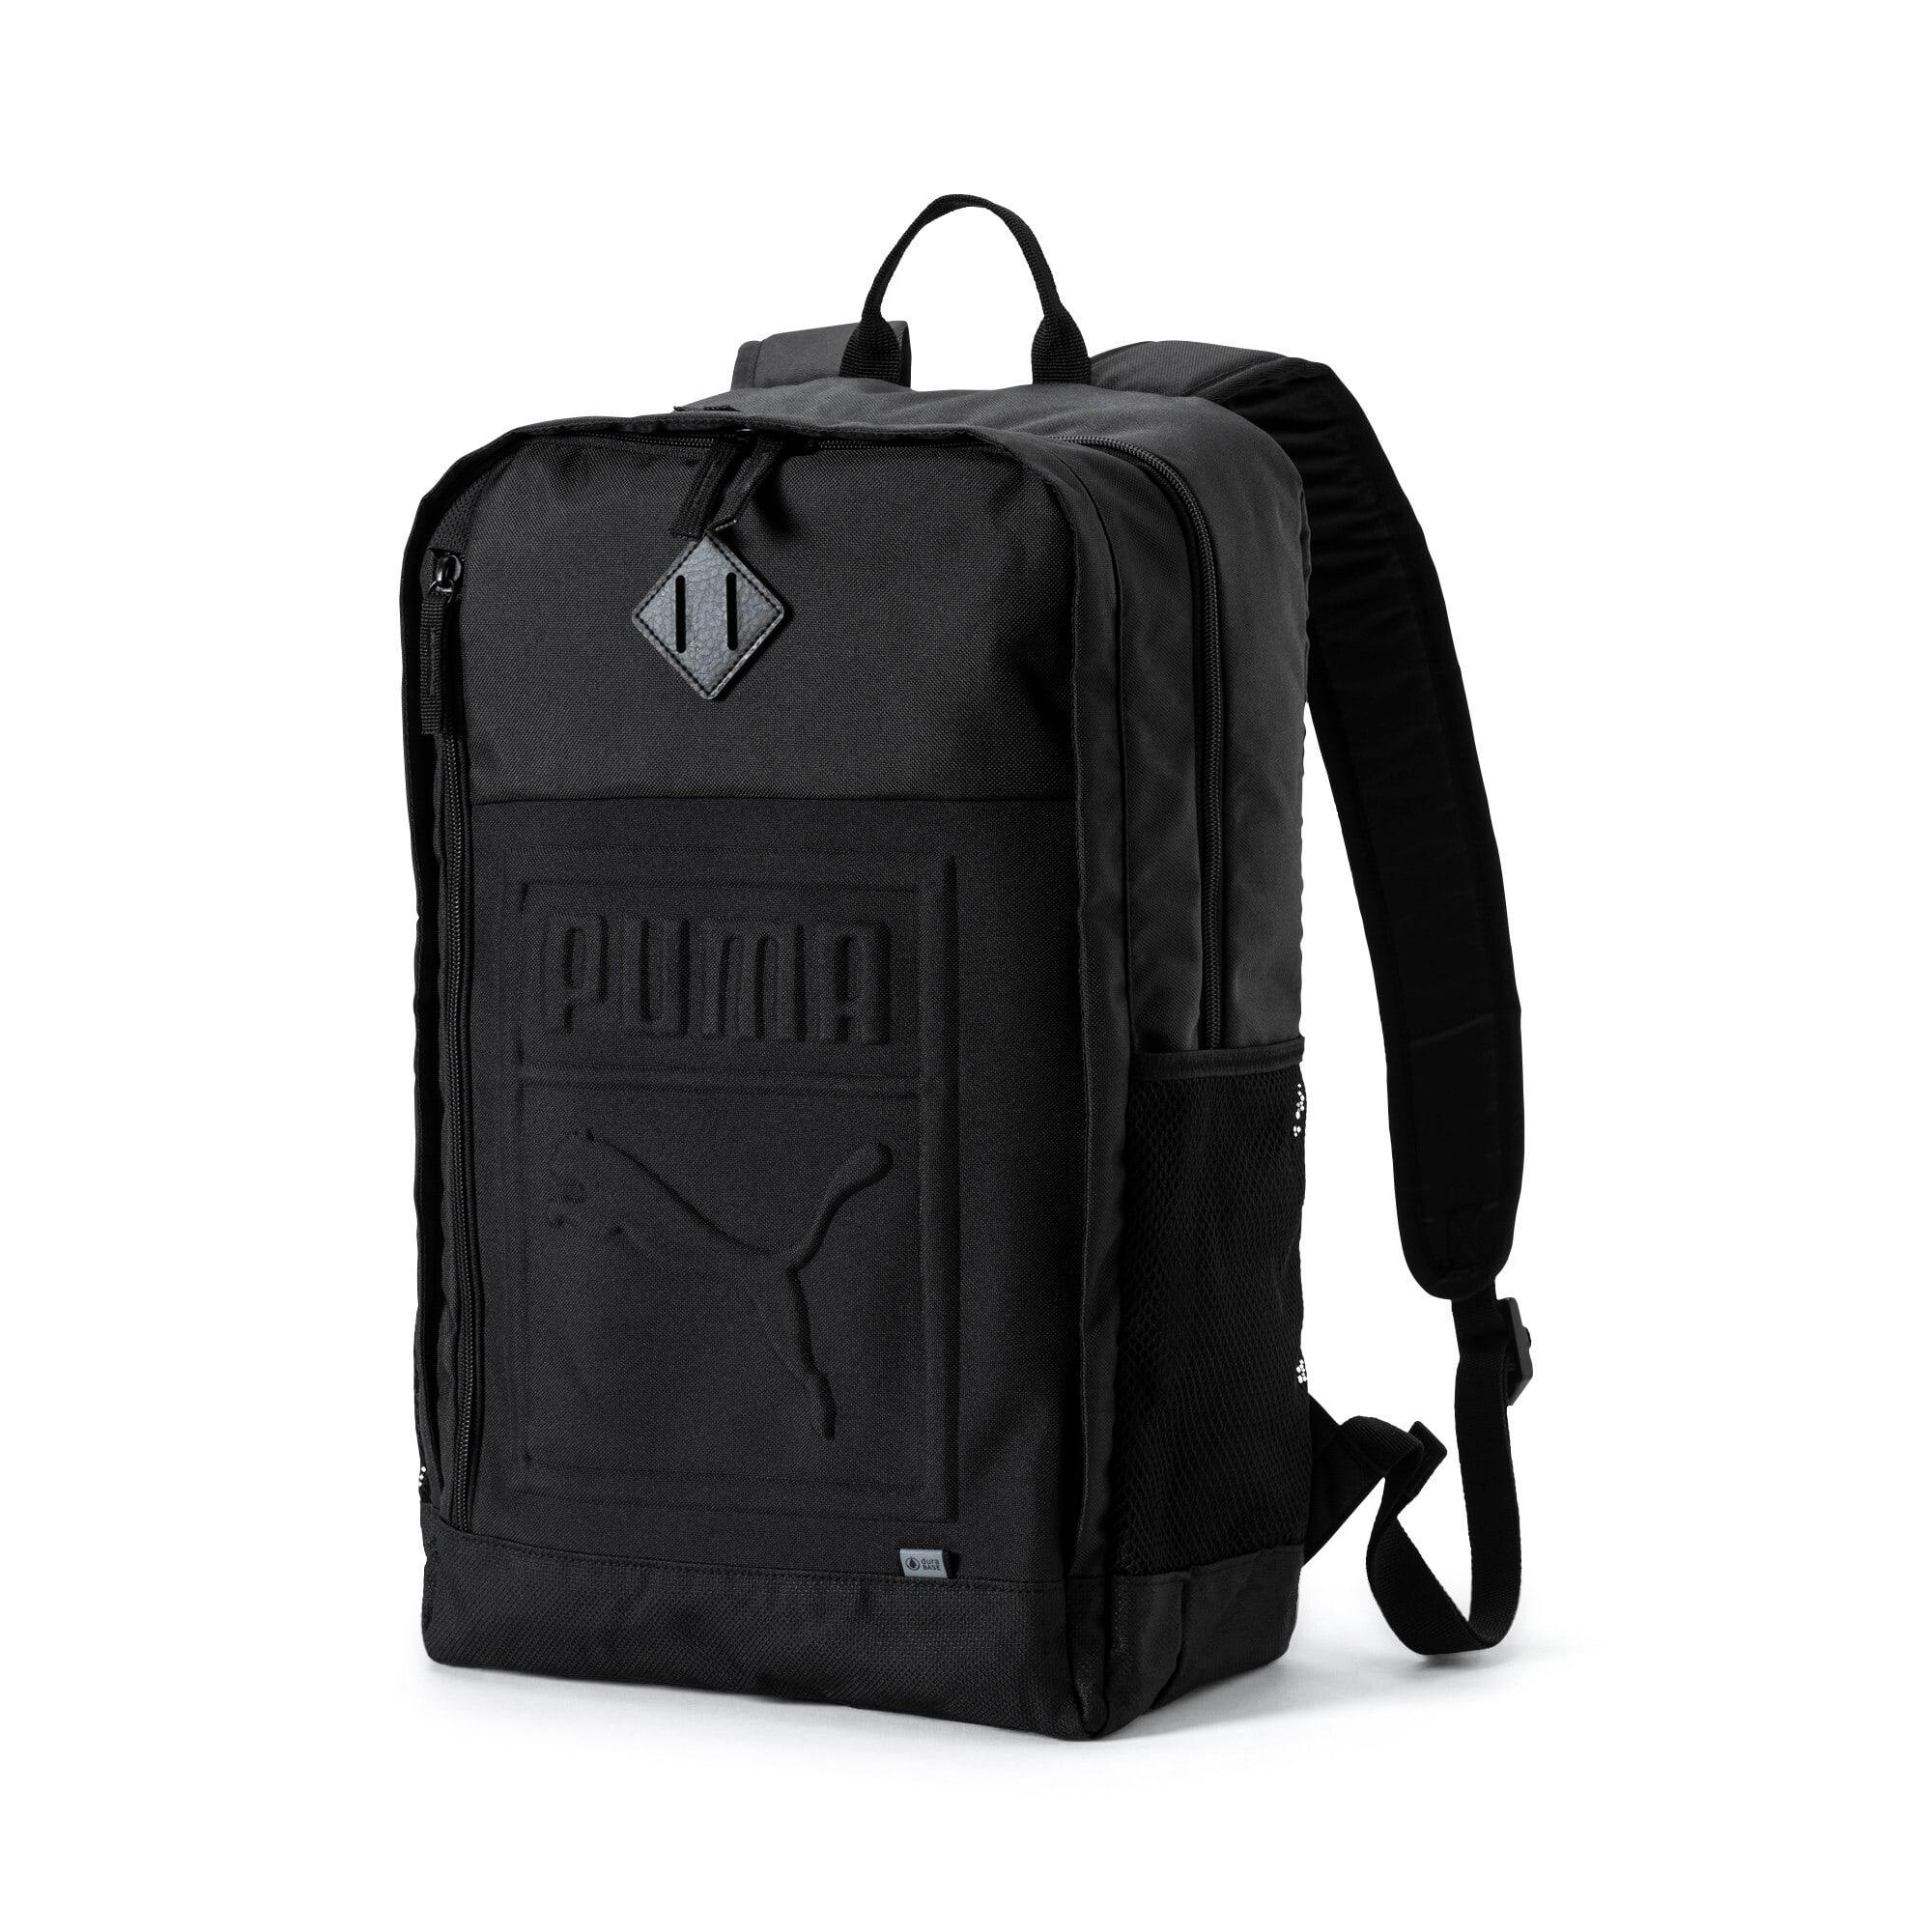 Thumbnail 1 of Square Backpack, Puma Black, medium